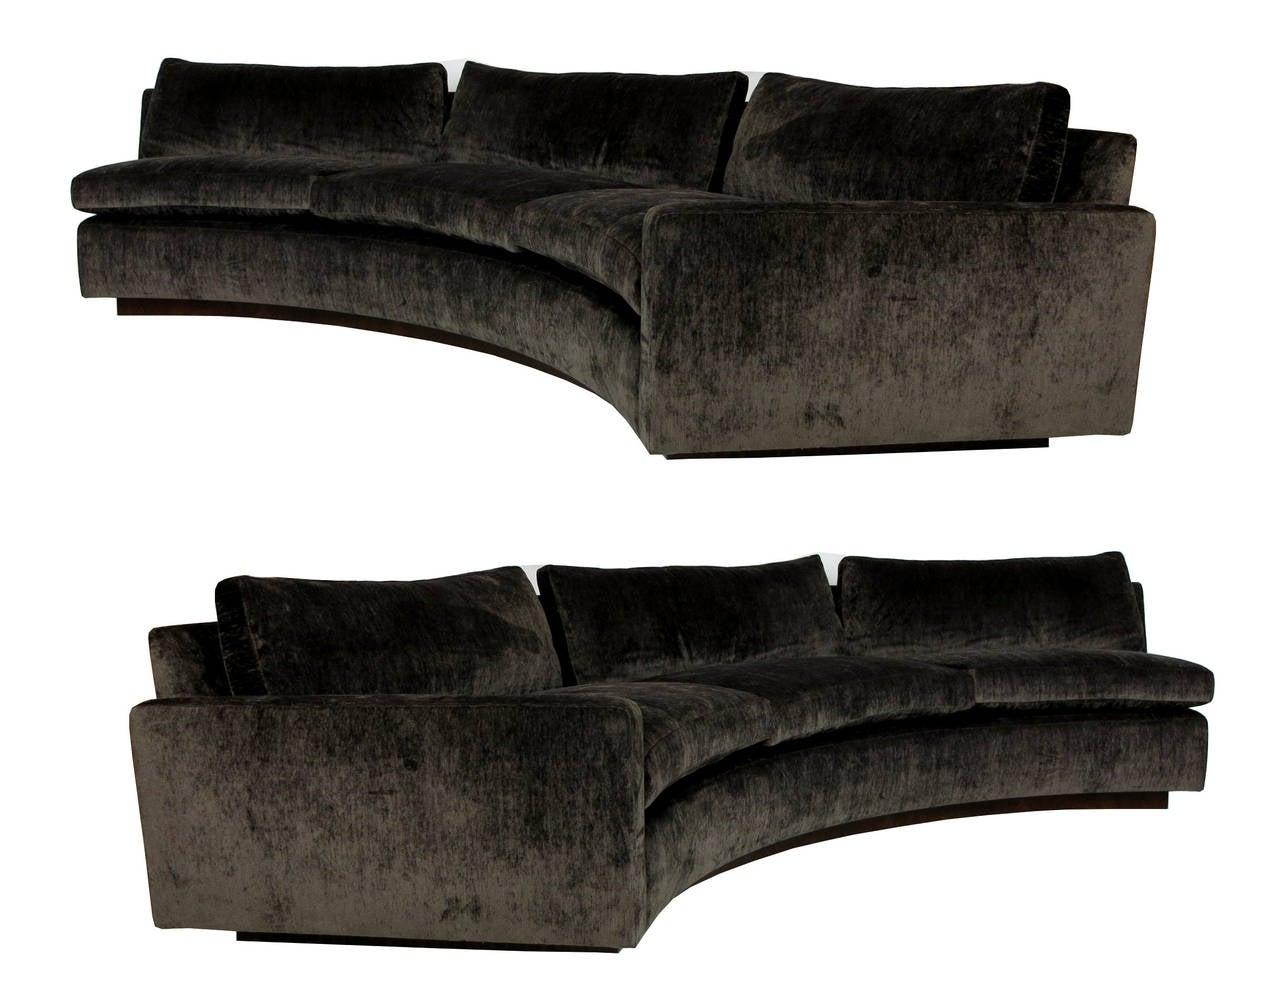 half circle sofas tiendas de fundas sofa en leon large sectional by milo baughman for